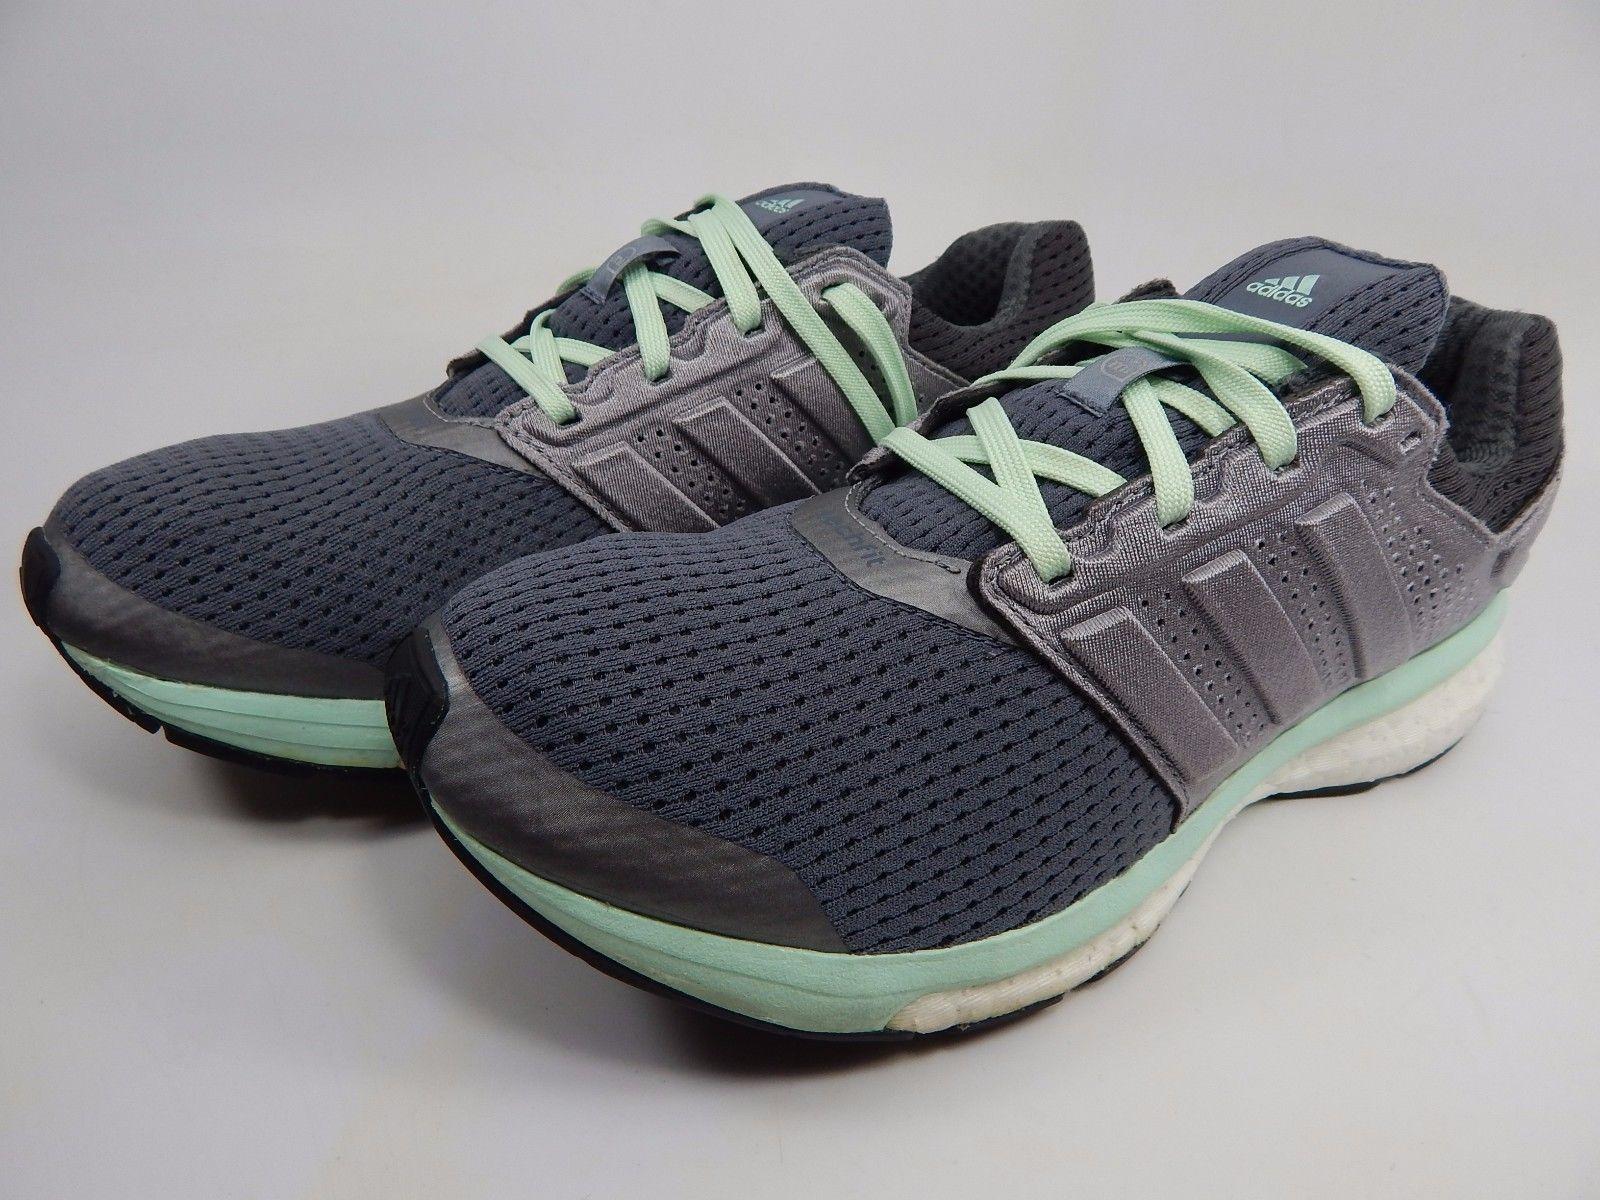 Adidas Glide Boost 7 Women's Running Shoes Size US 7 M (B) EU 38 2/3 Gray B33603